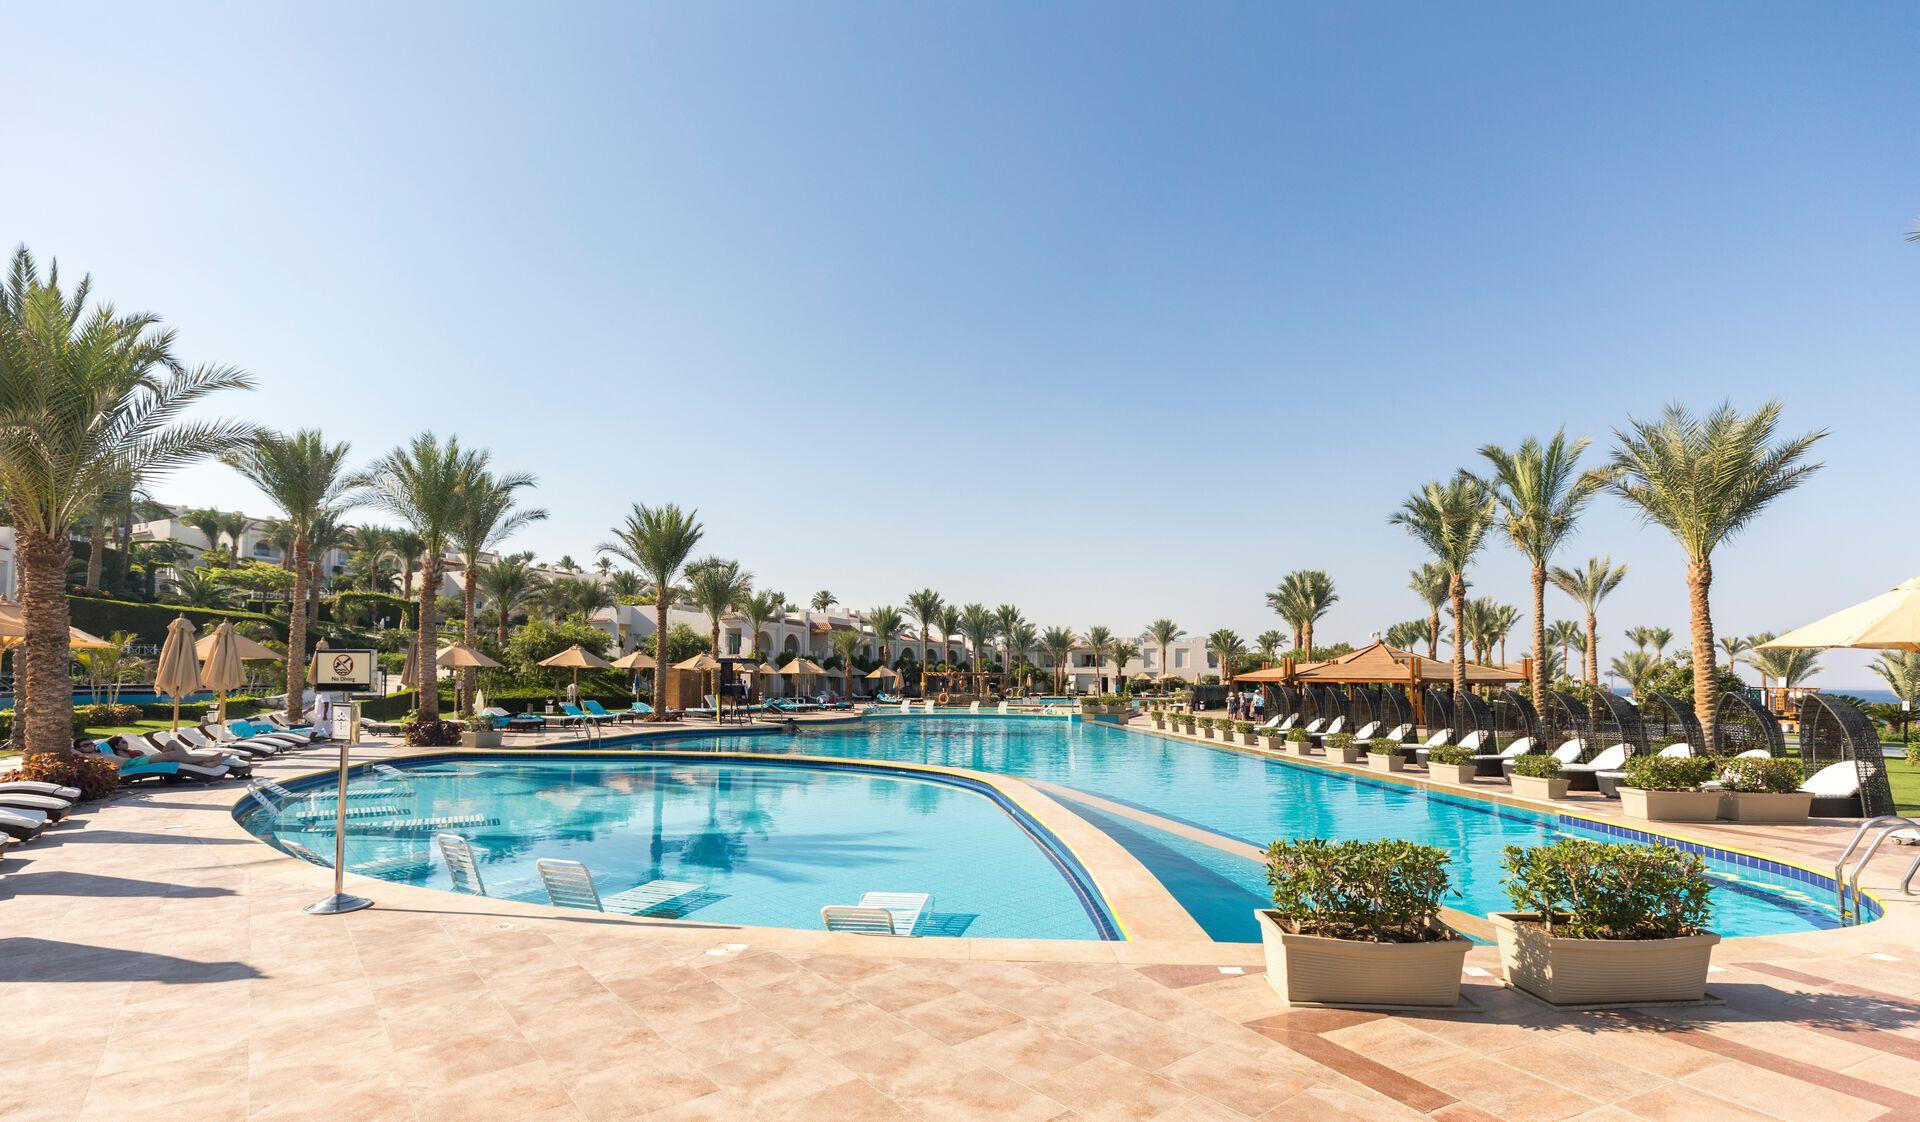 Sunrise Montemare Resort - Grand Select -